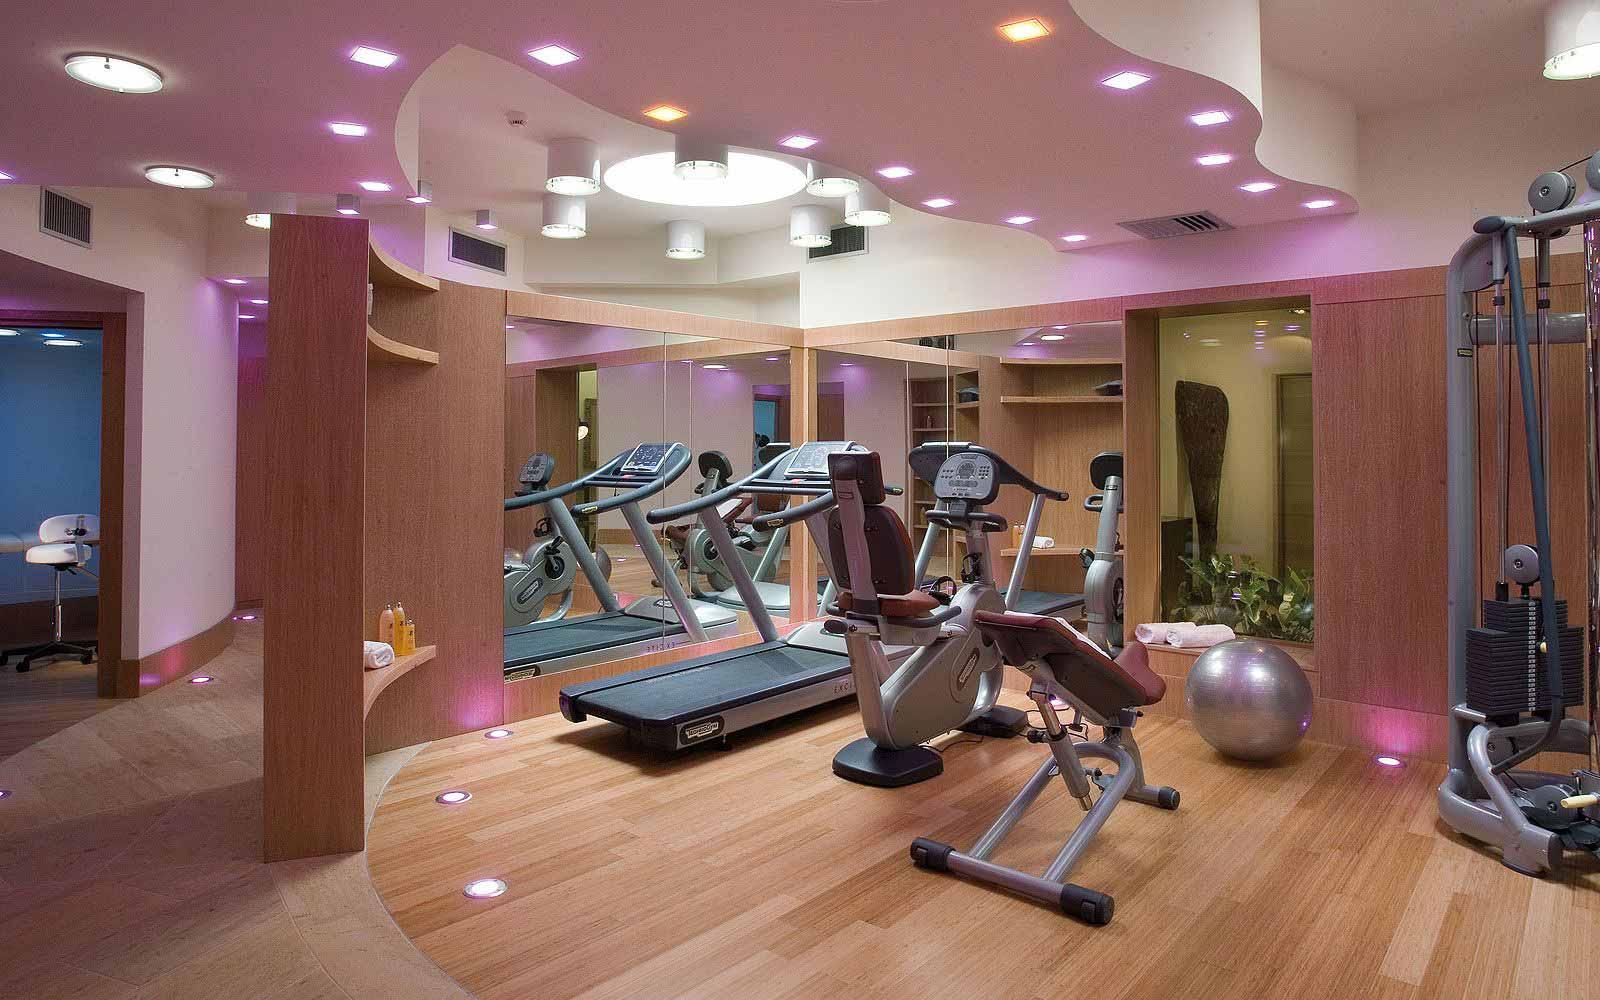 Gym at the L'Ea Bianca Luxury Resort